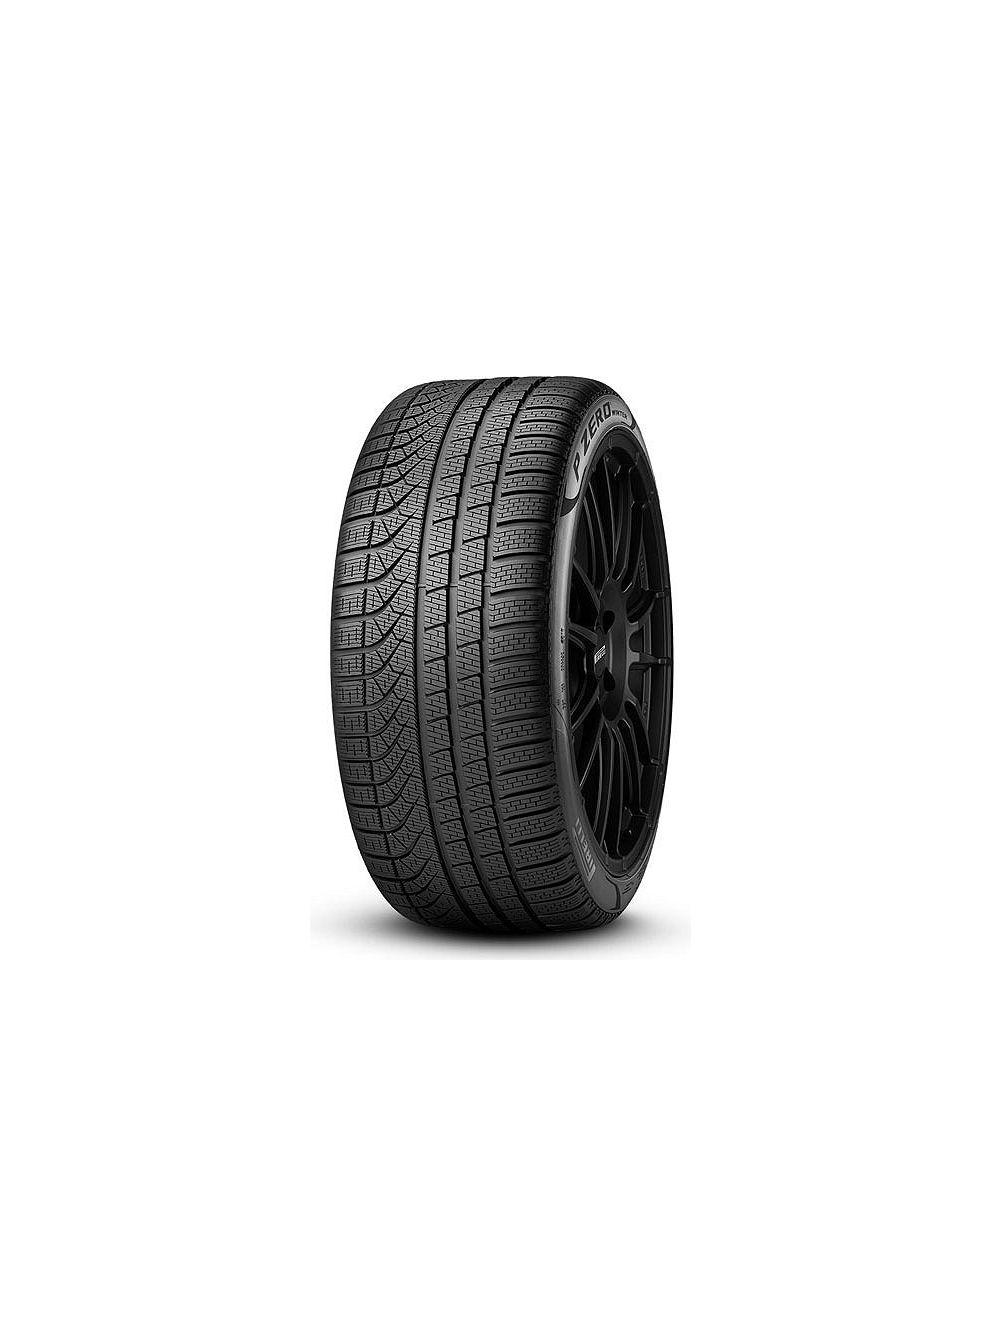 Pirelli 255/45R19 V PZero Winter XL MO1 Téli gumi